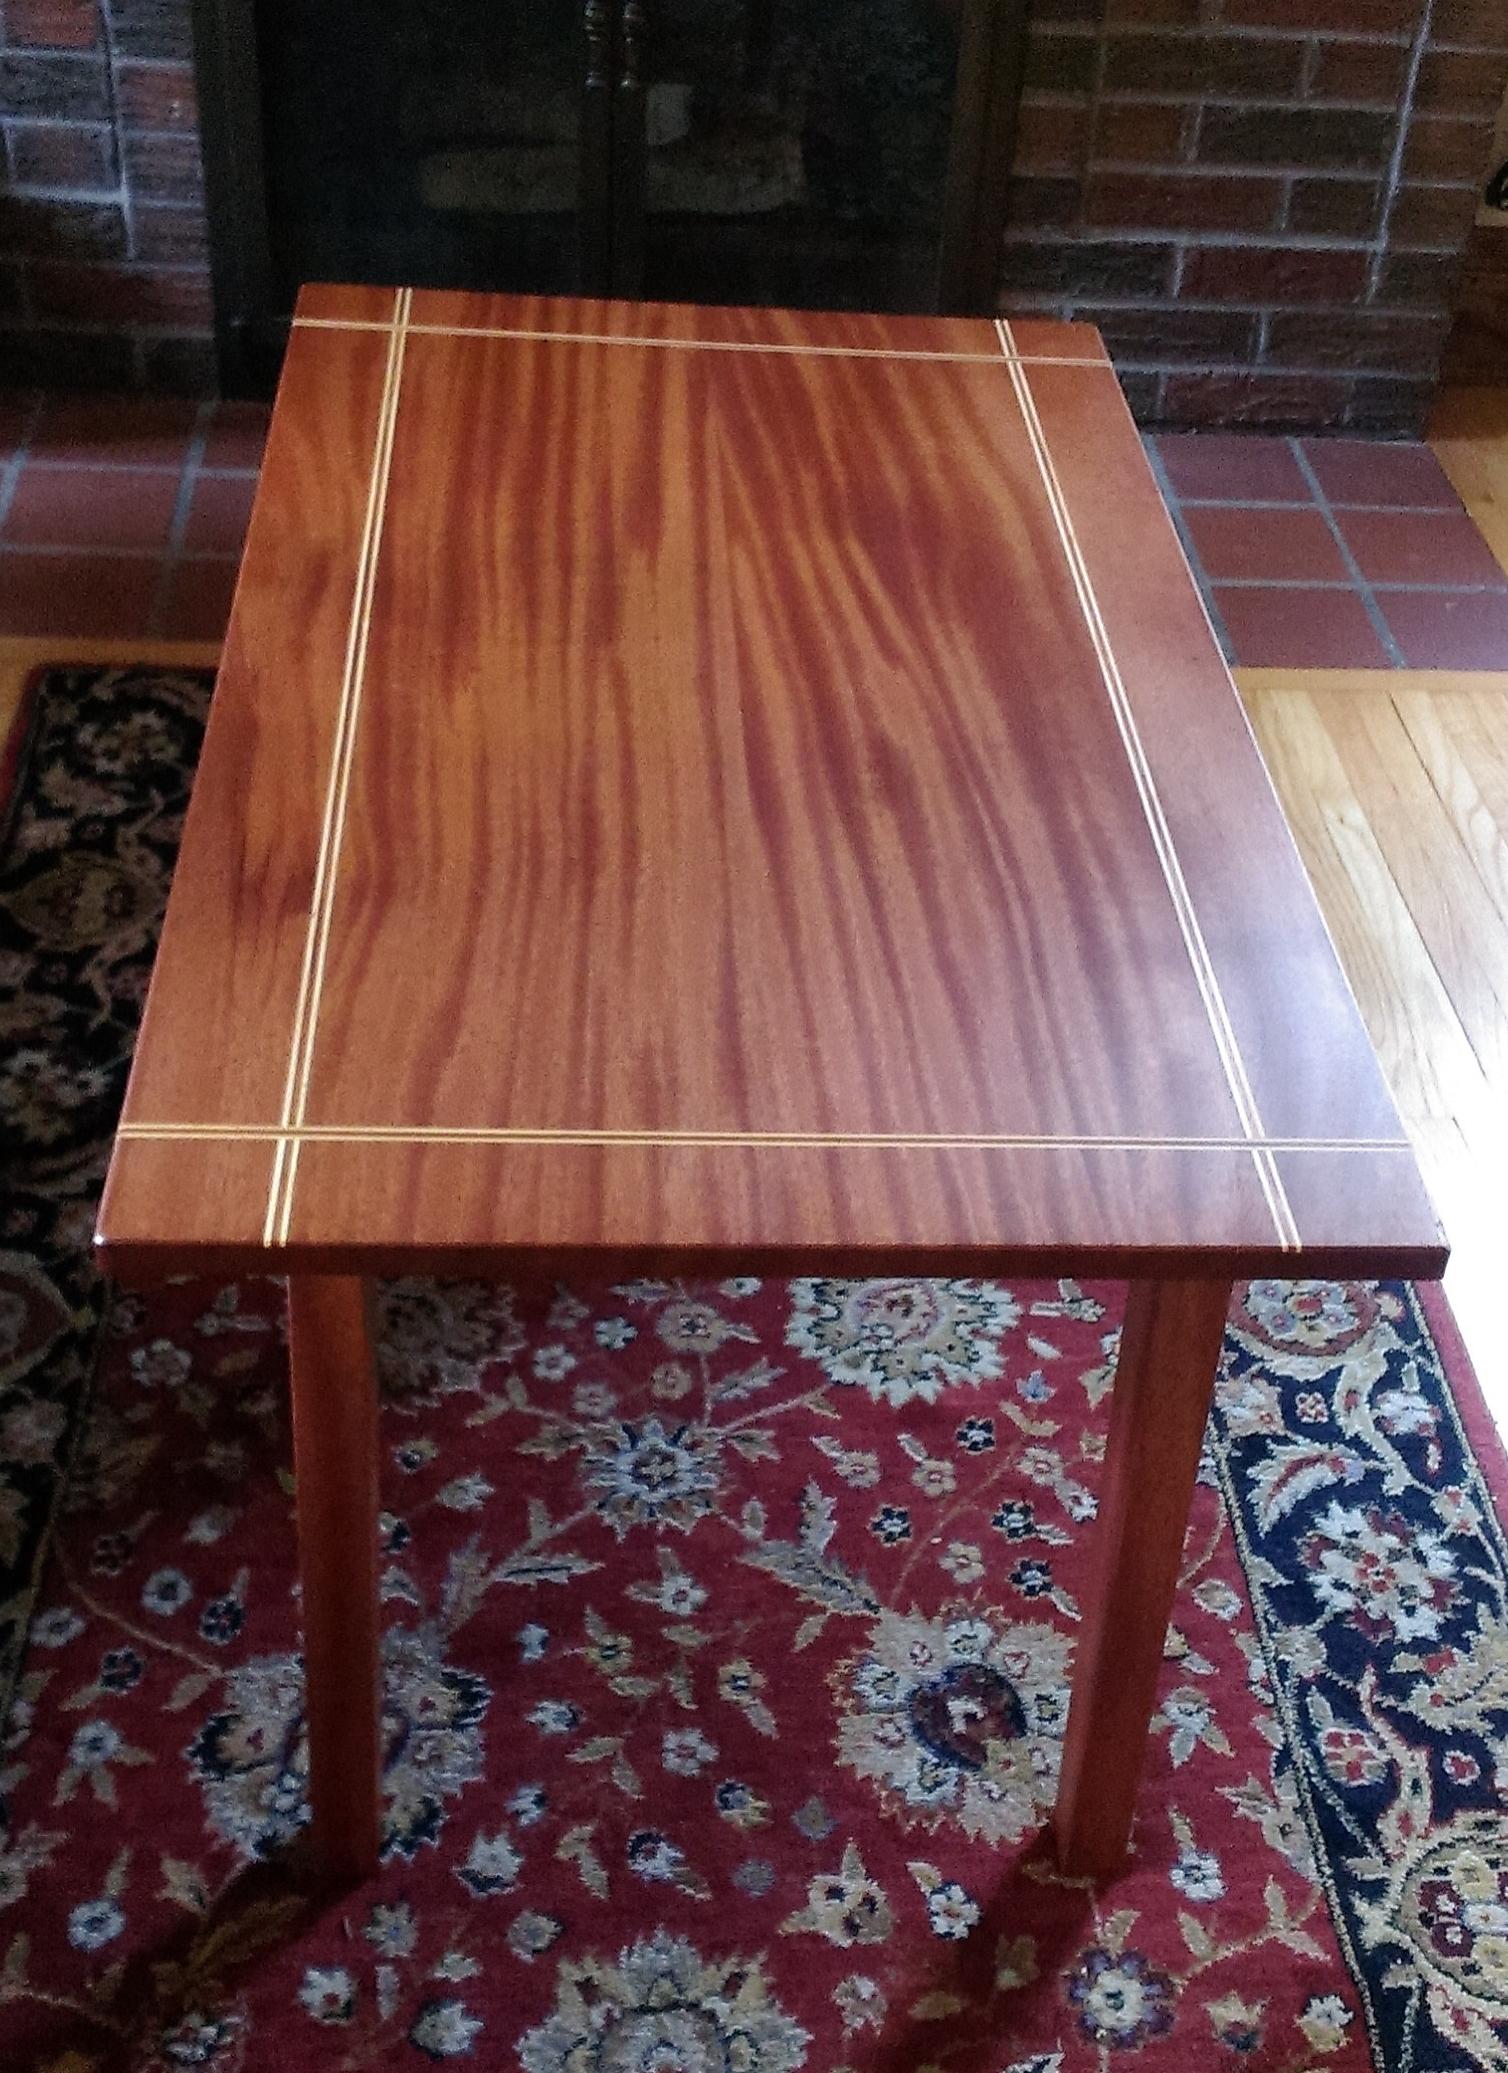 Coffee Table - Khaya with Maple Inlay